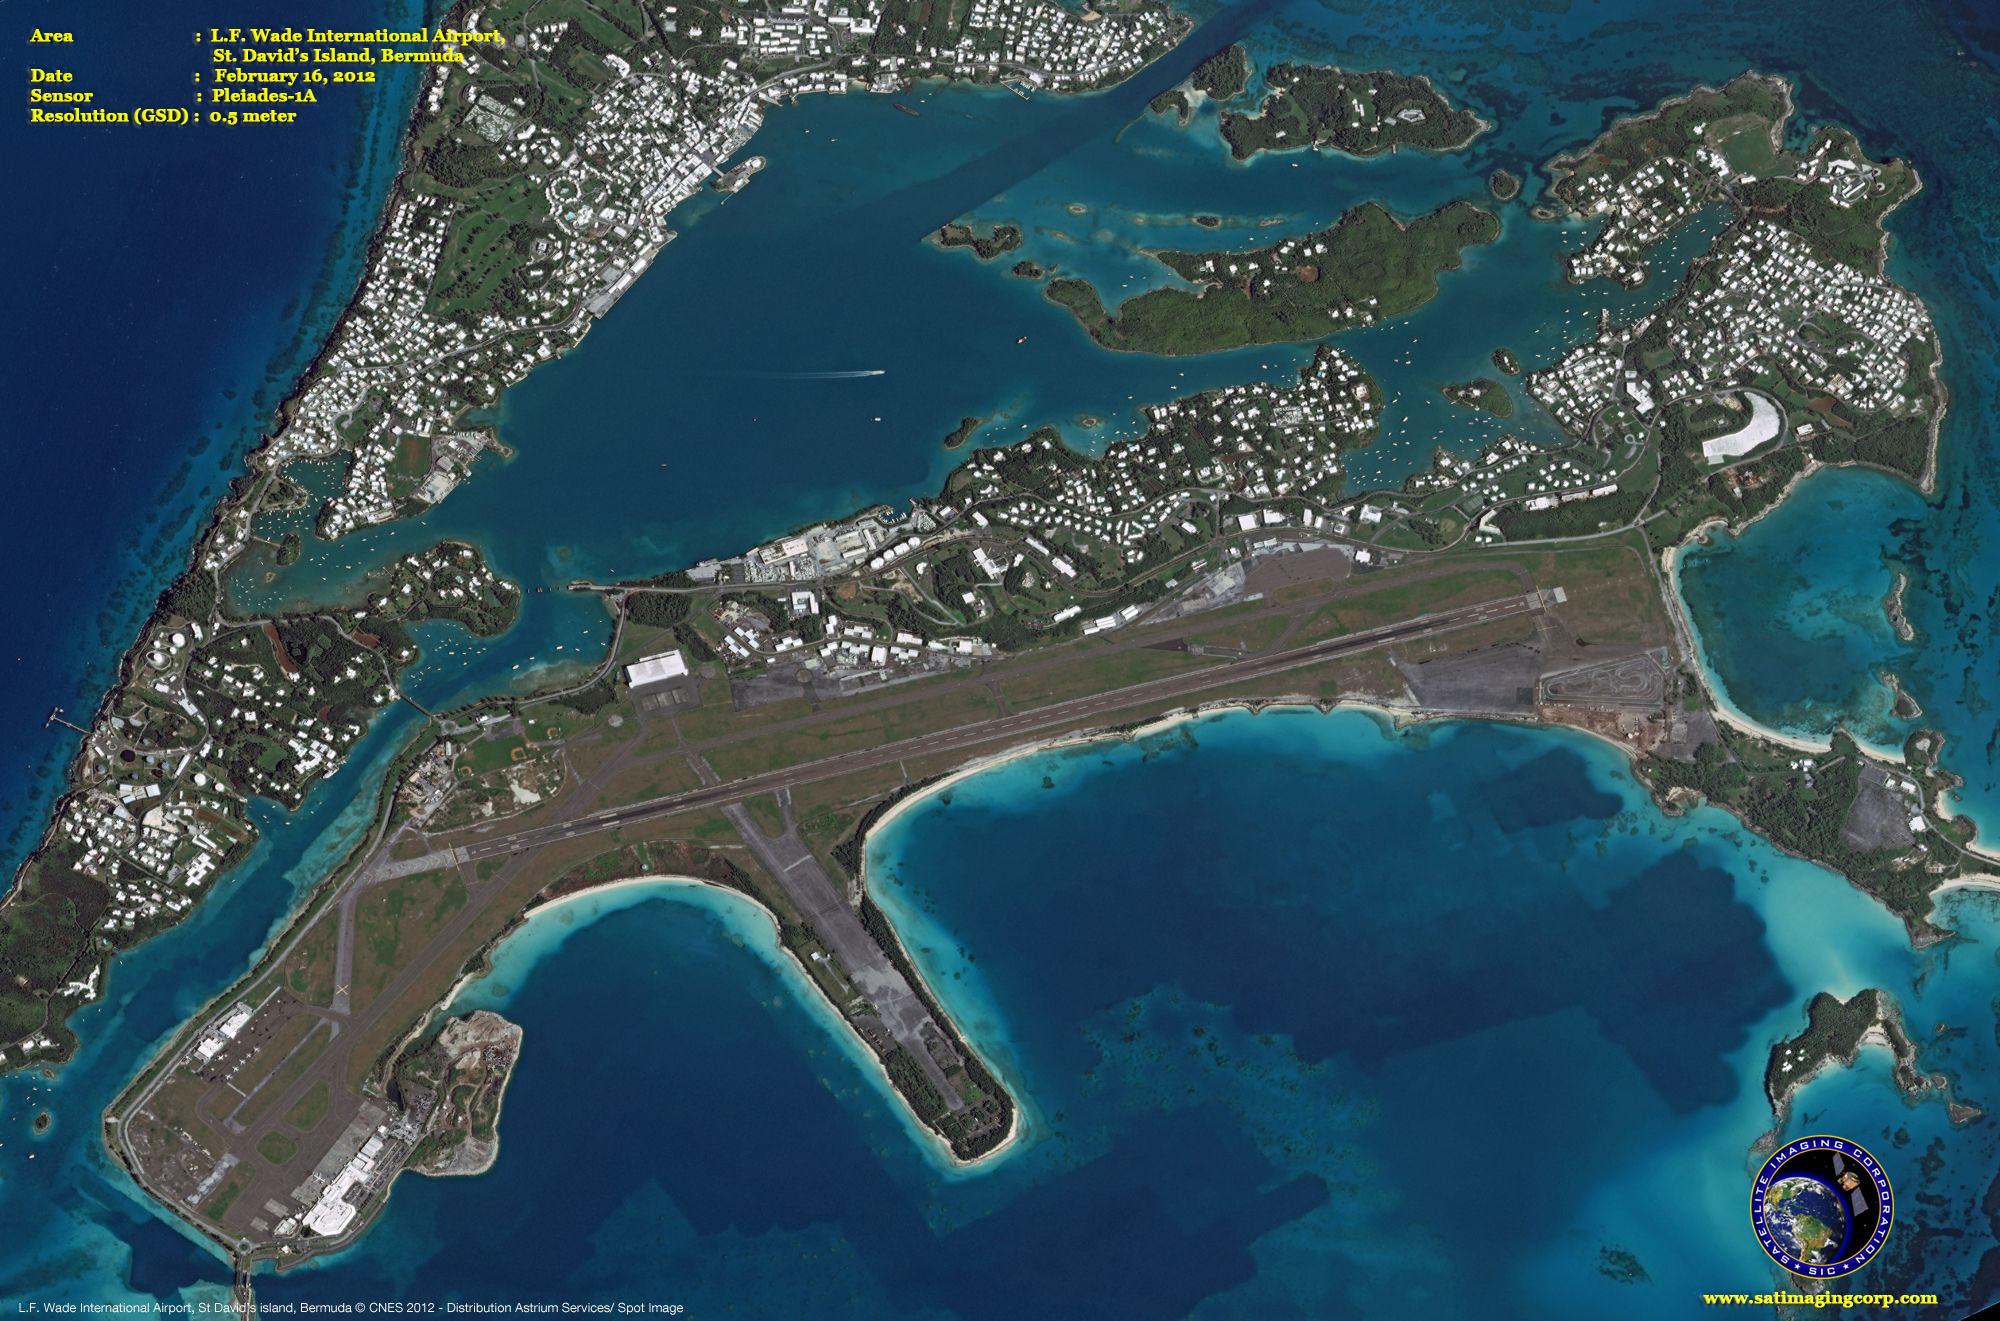 Hamilton Island Accommodation | Hotels, Deals & Great ...